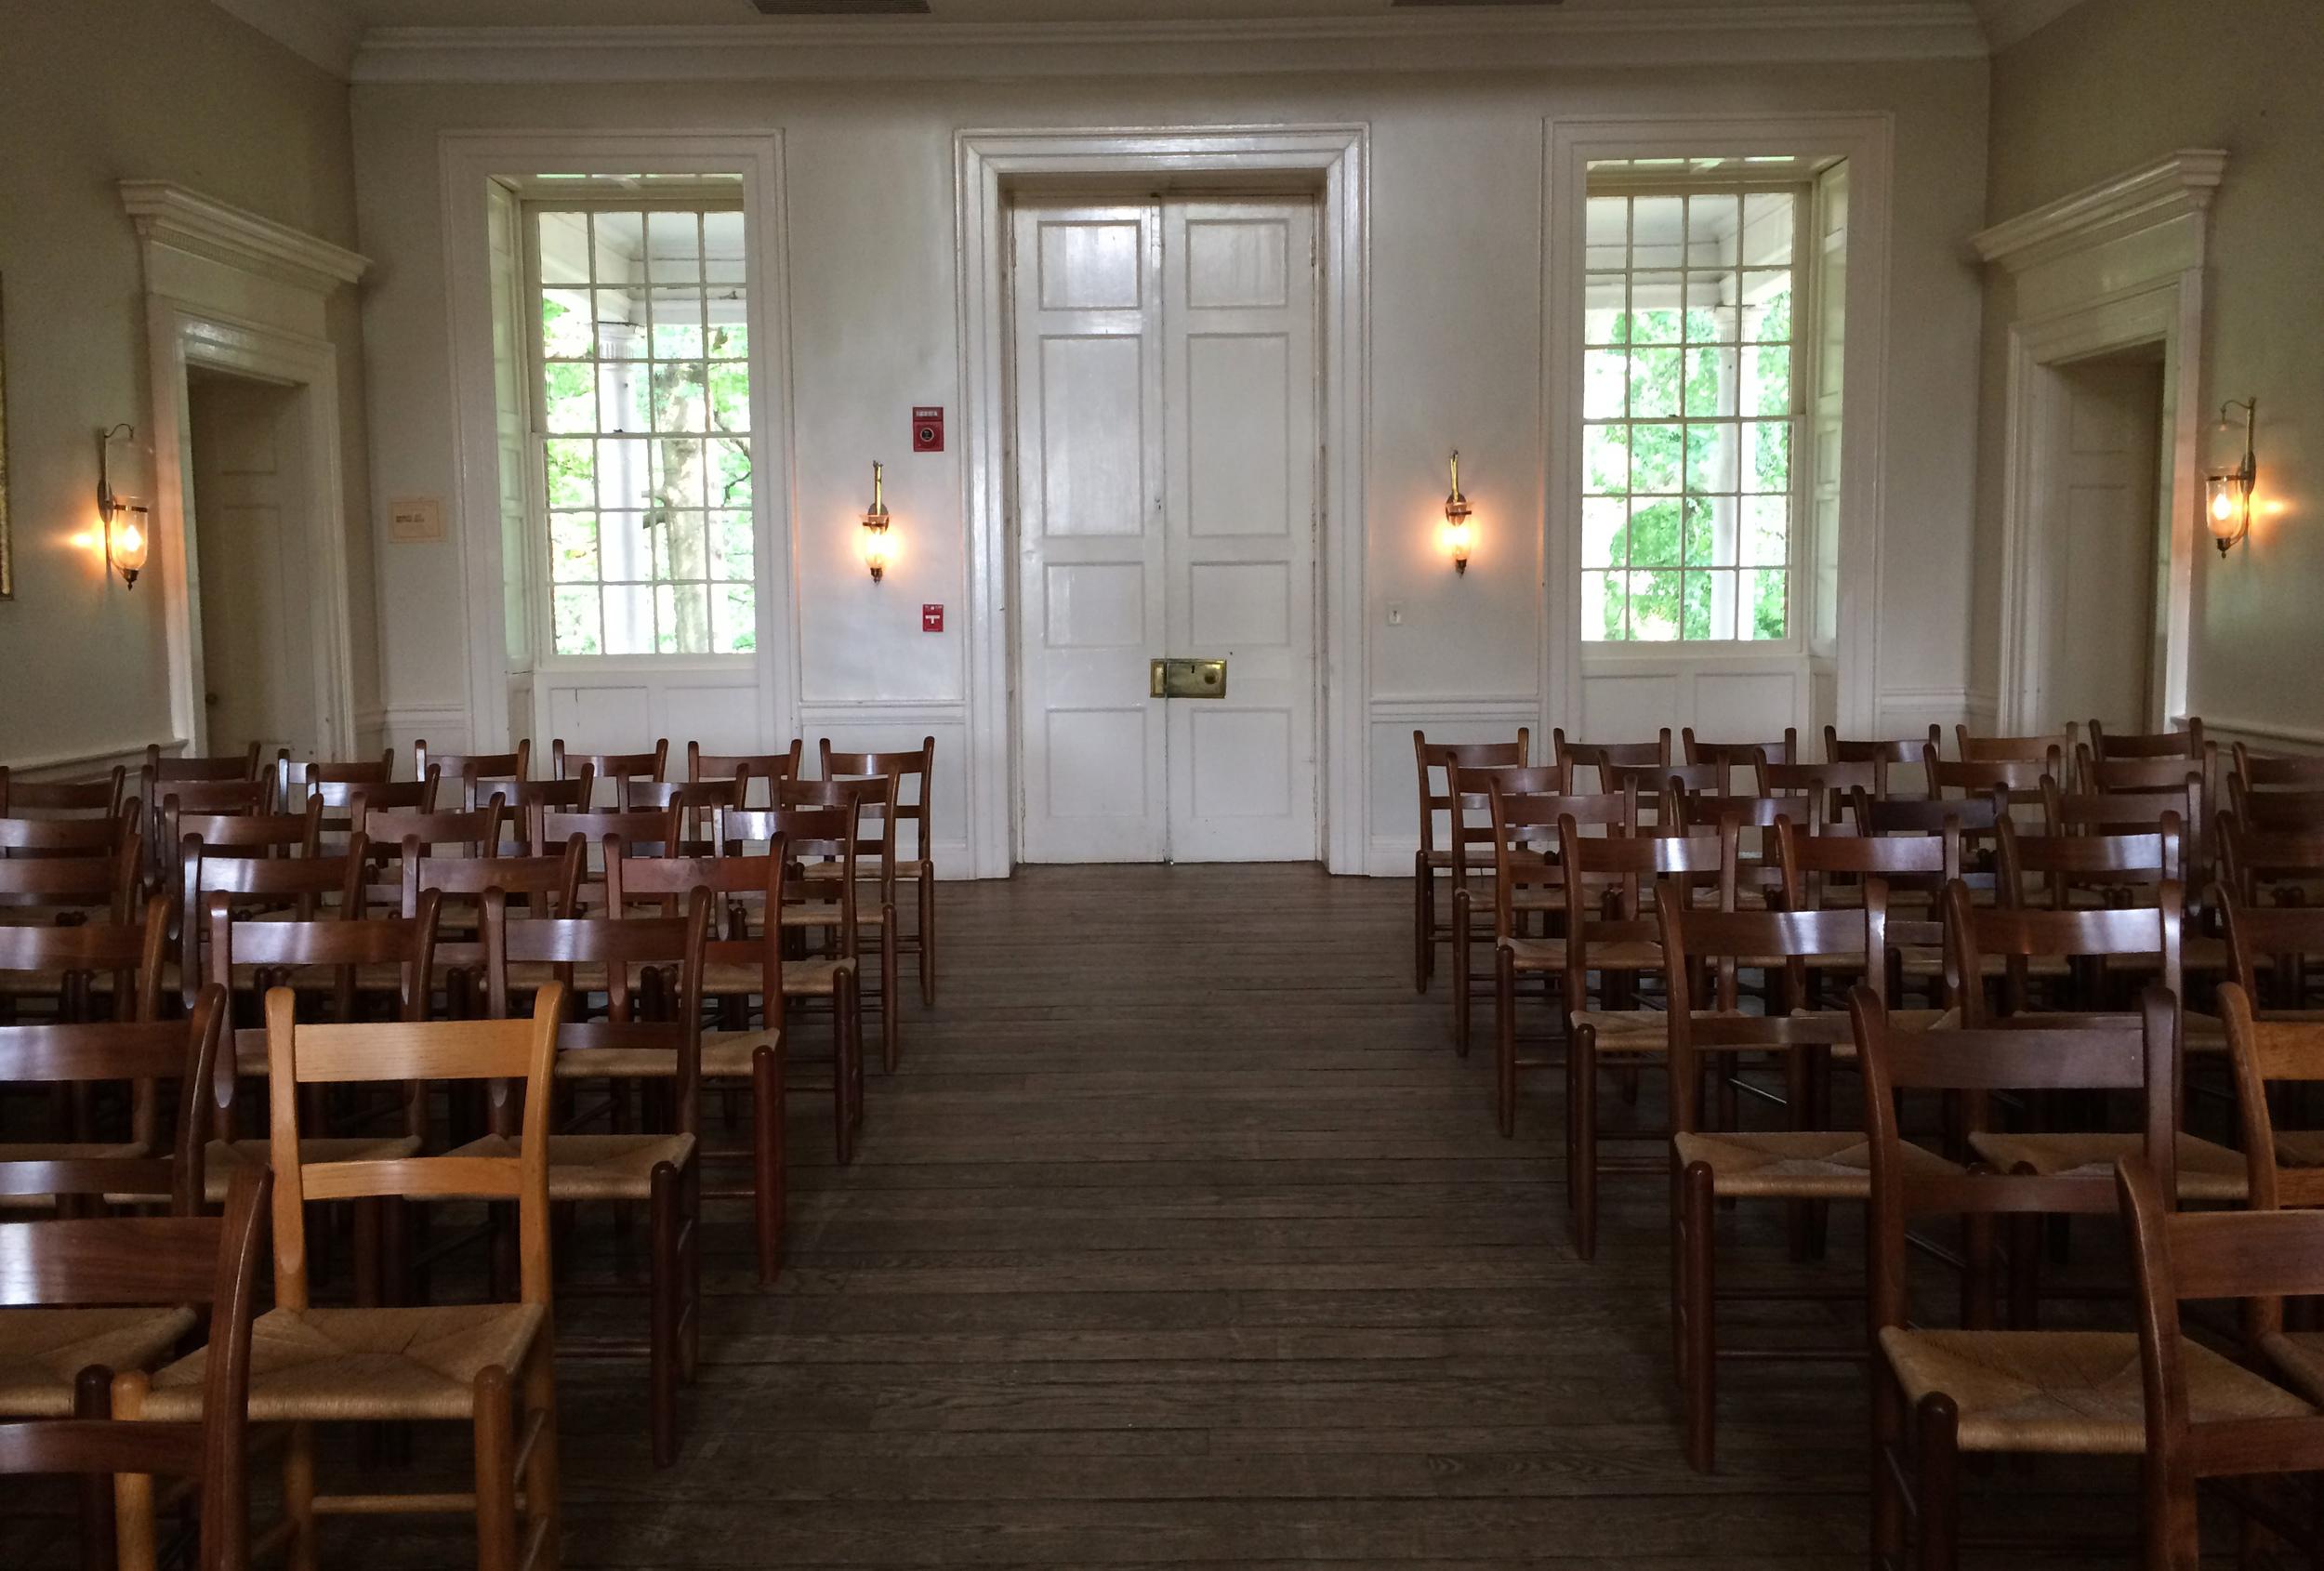 Inside McDowell Hall